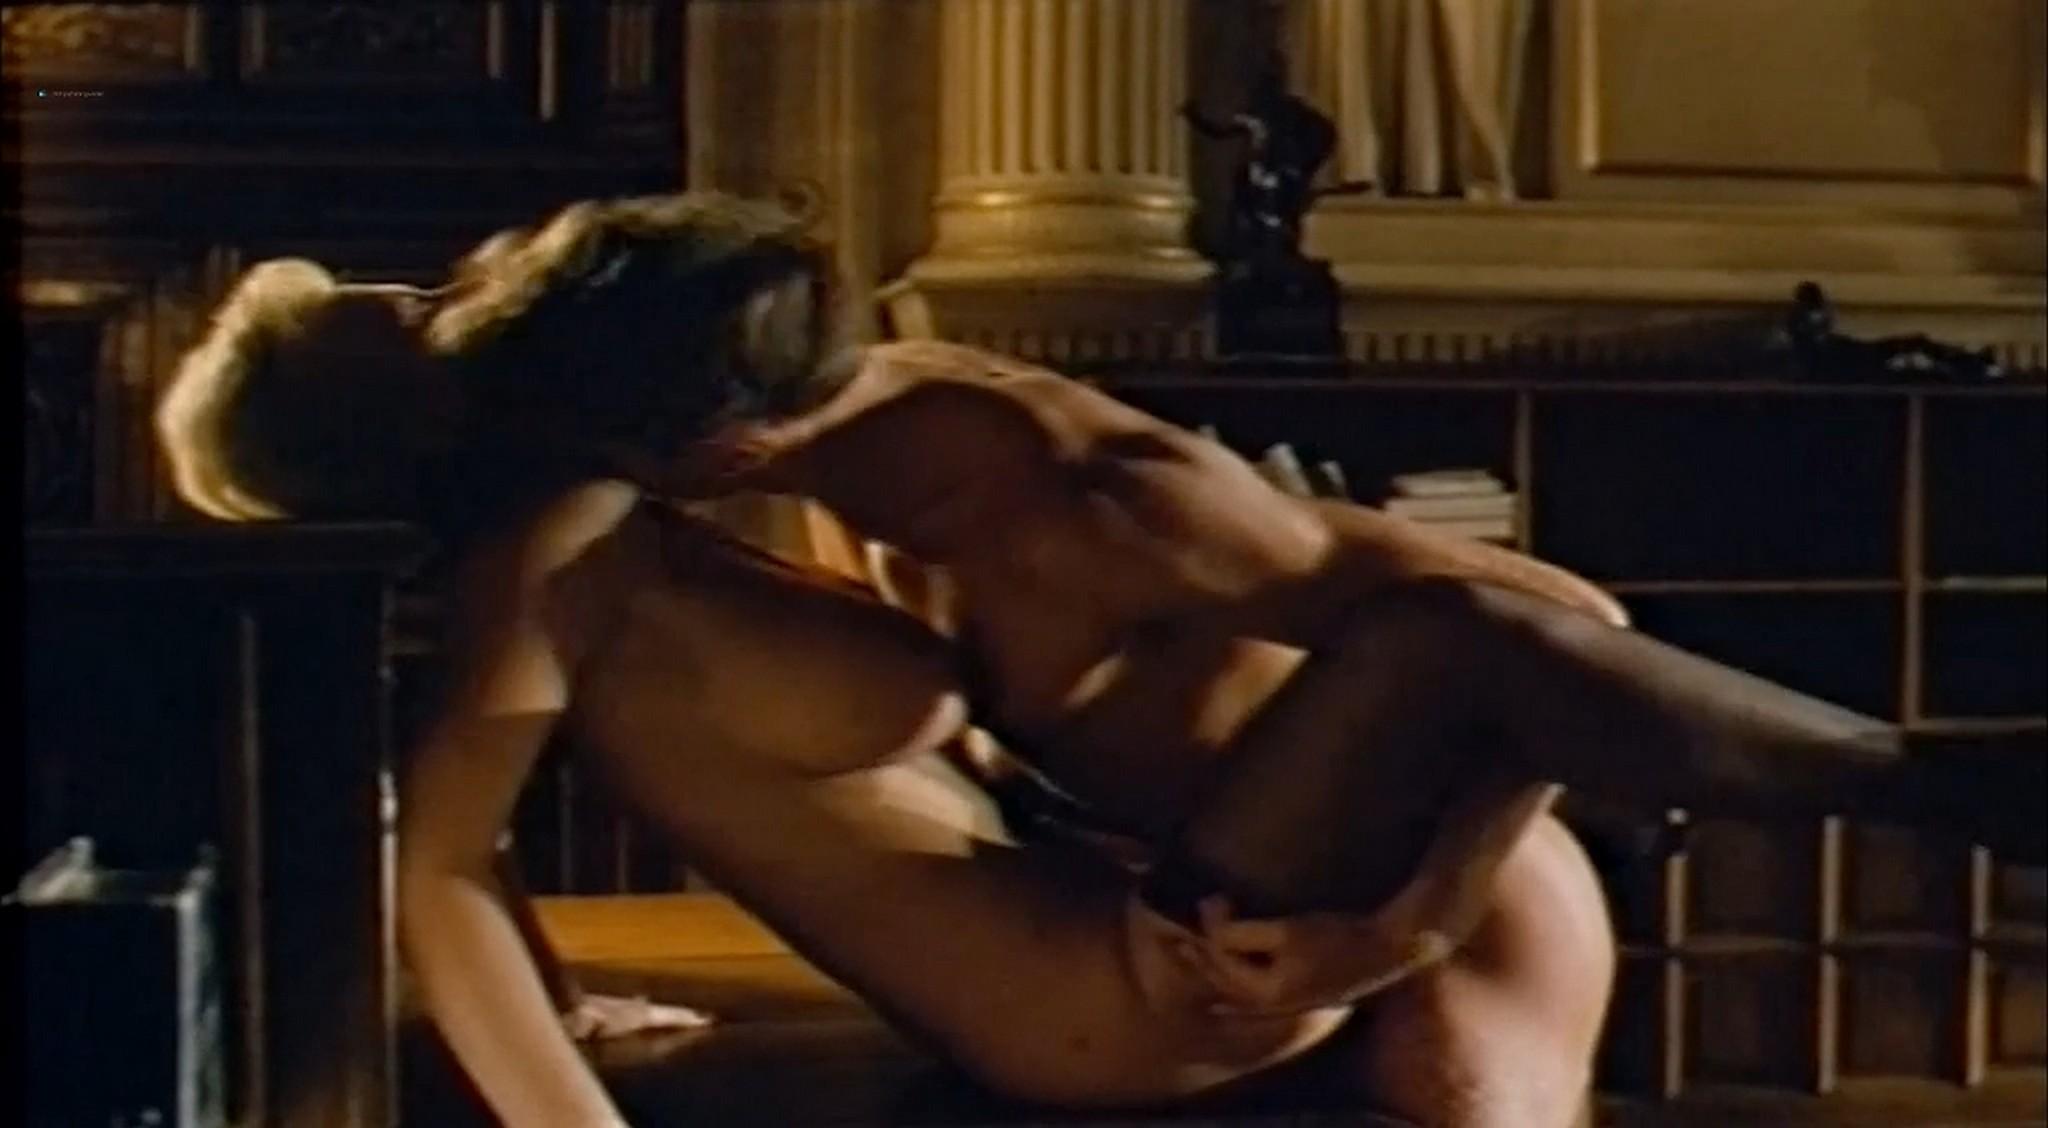 Carolyn Monroe nude Caroline Laurence and others nude sex Emmanuelle 7 1993 DVDRip 18